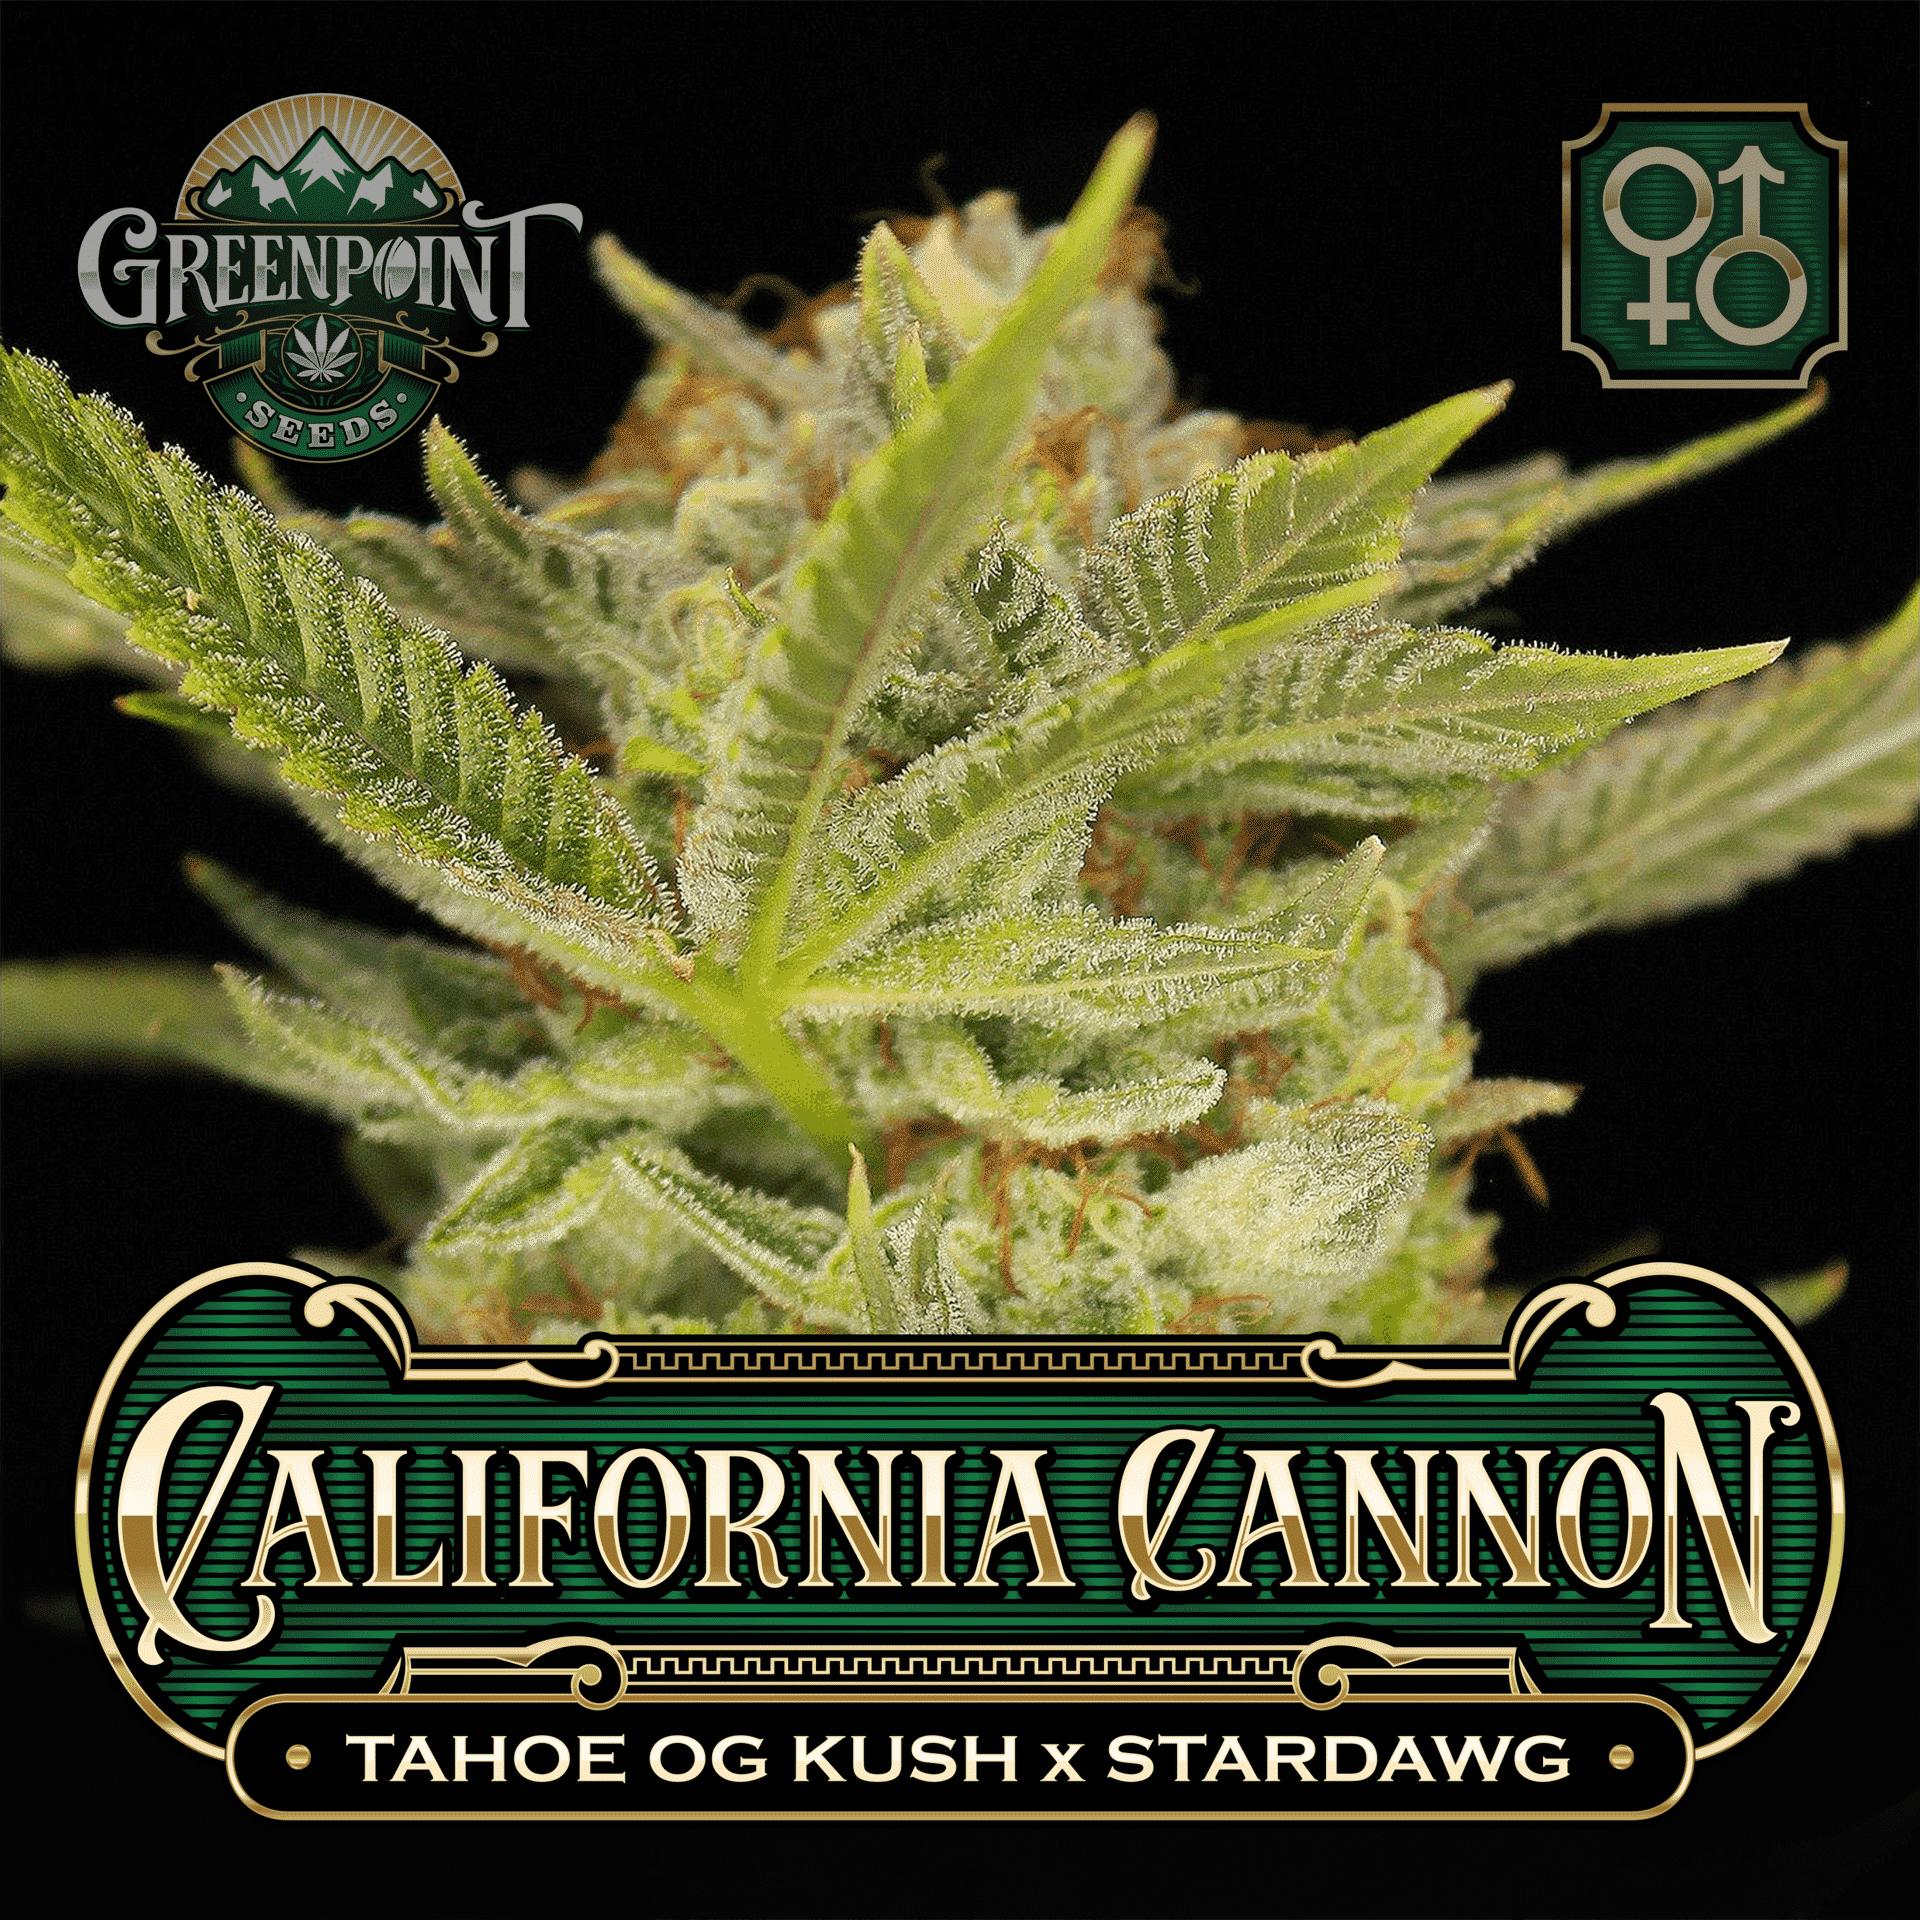 California Cannon - Tahoe OG Kush x Stardawg Strain   Greenpoint Seeds